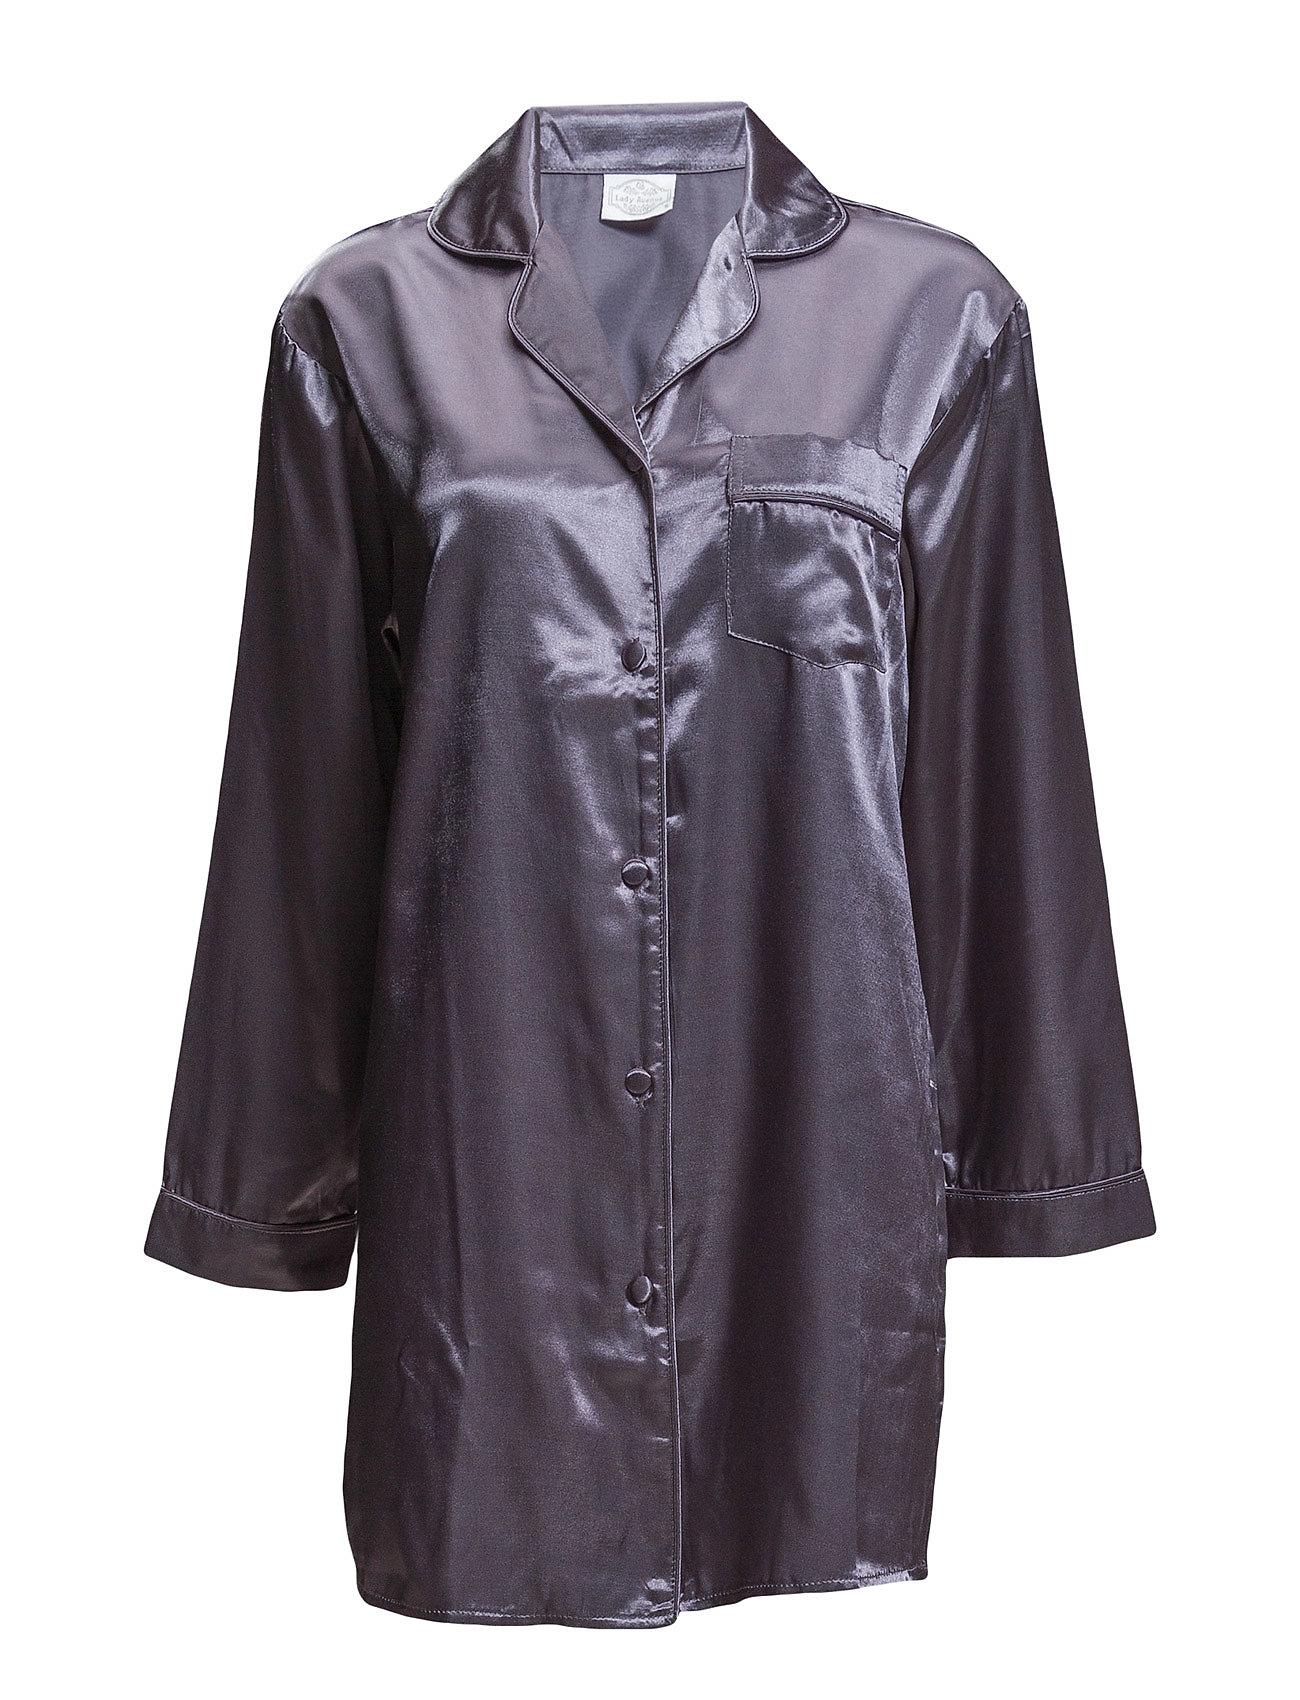 Lady Avenue Satin Long Sleeve Nightshirt - CHARCOAL